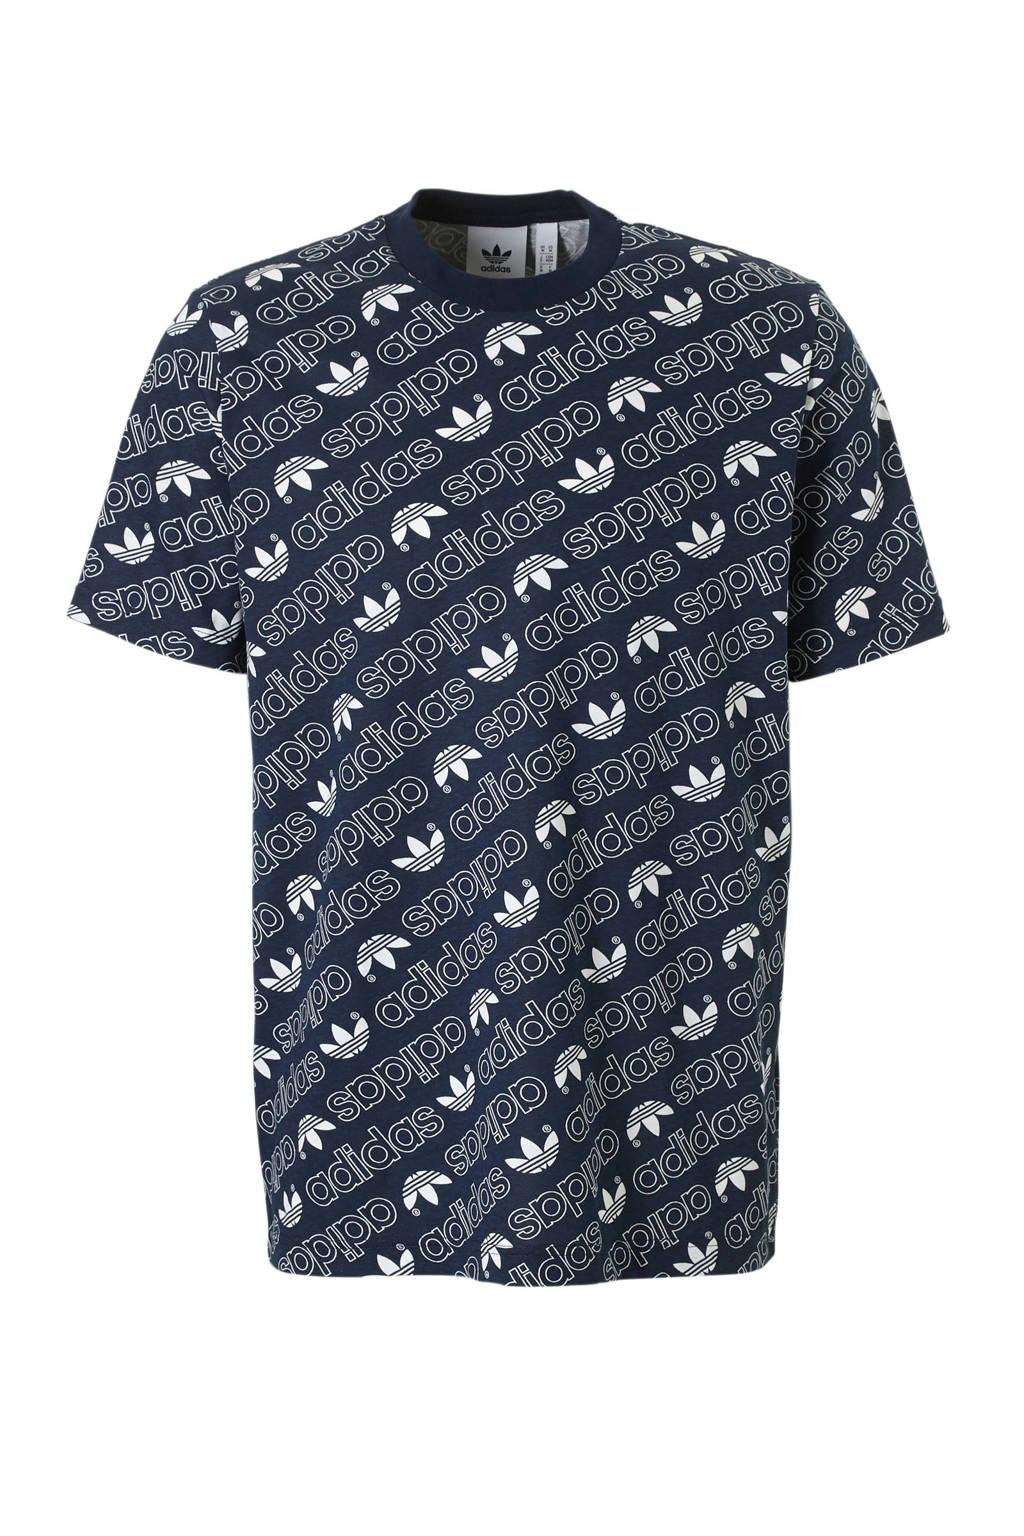 adidas originals   T-shirt met all-over print marine, Marine